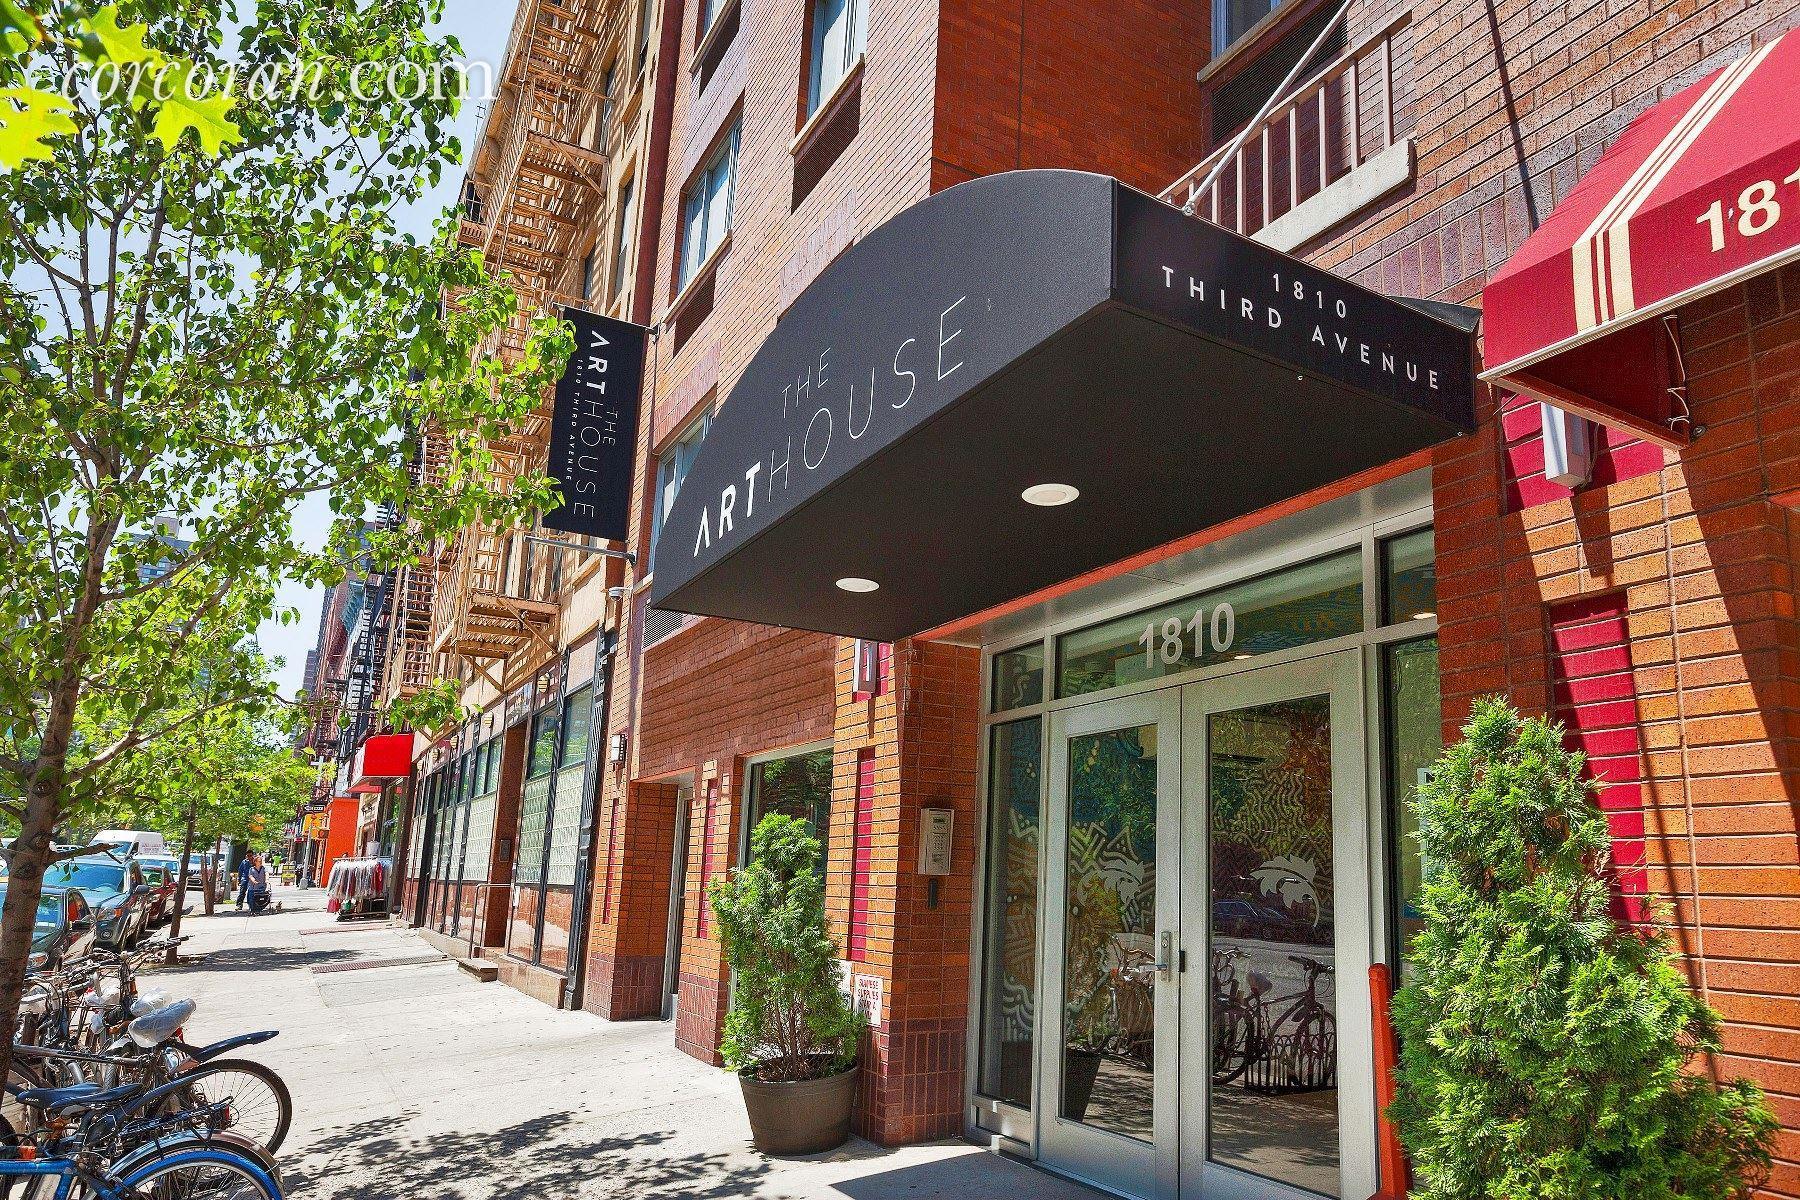 Streeteasy The Art House Condominiums At 1810 Third